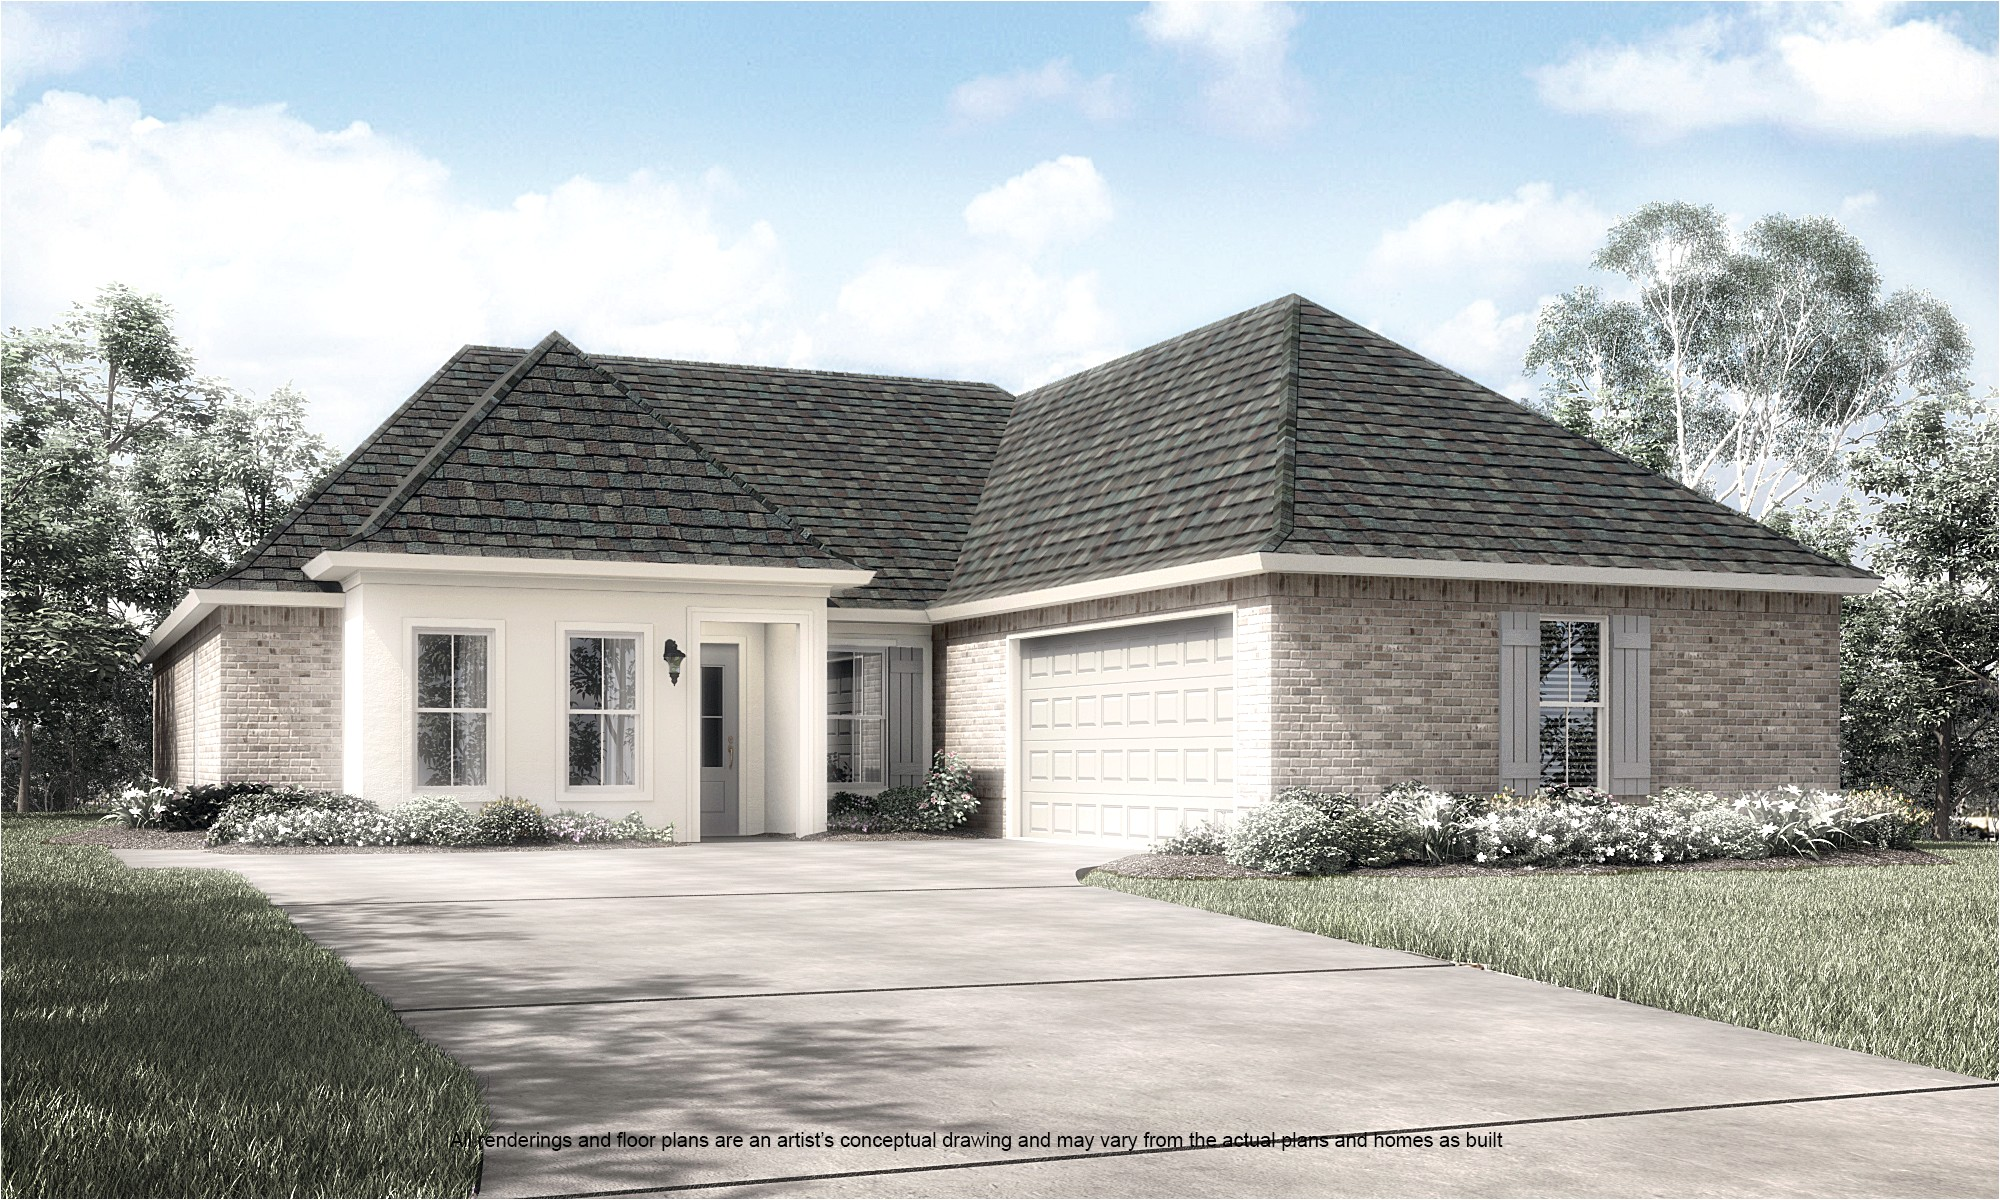 House Plans In Baton Rouge Level Homes Baton Rouge Myrtle Elva